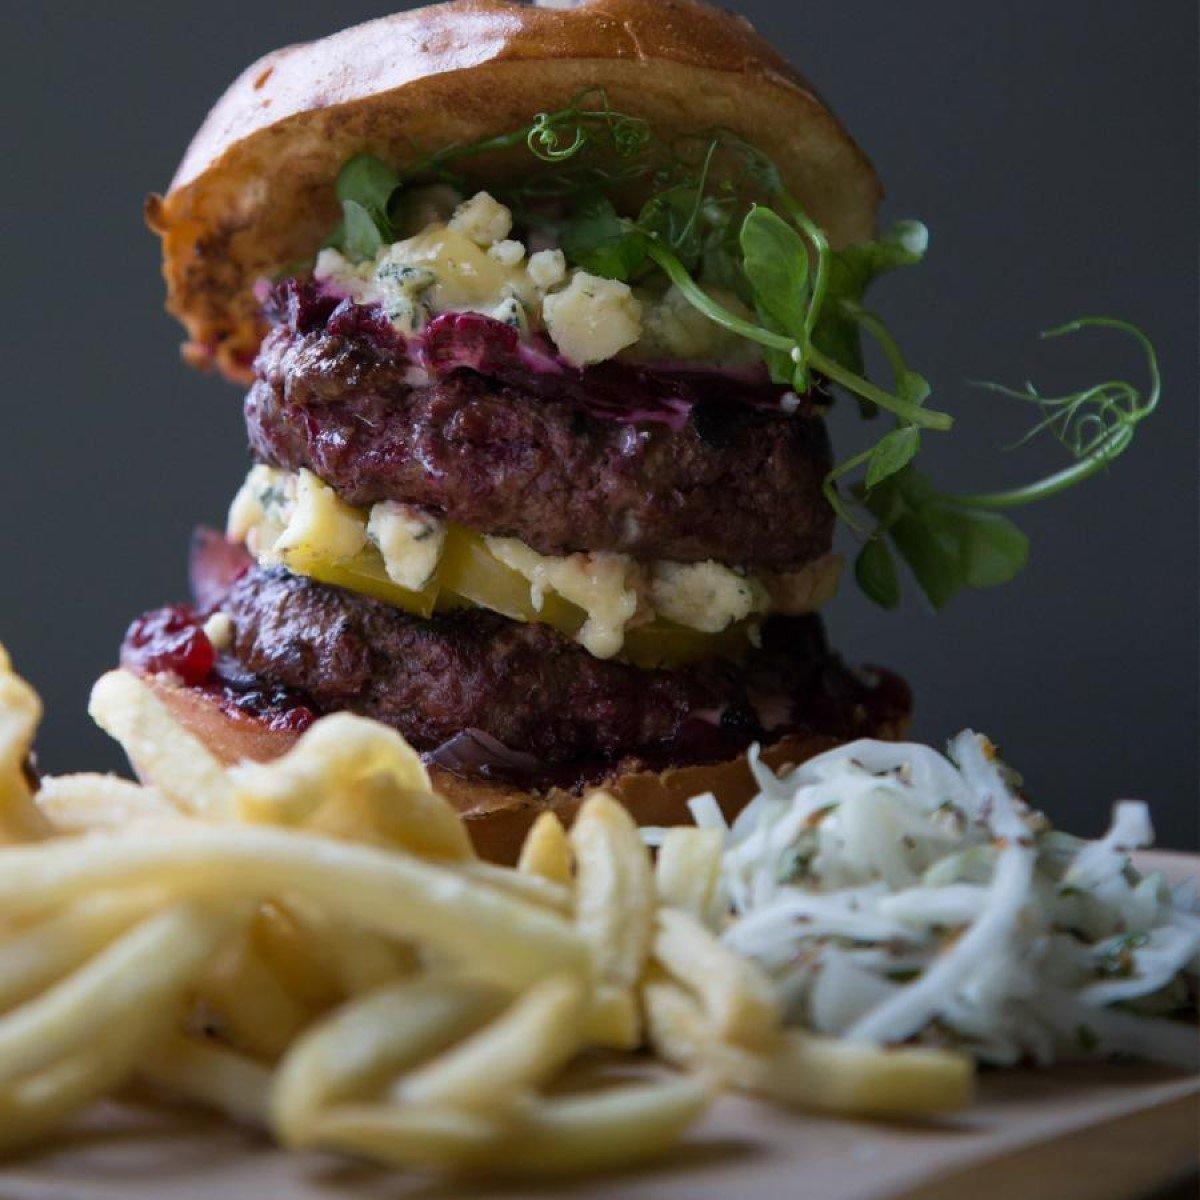 KuPP Oxford Signature Beef Burger - £12.50